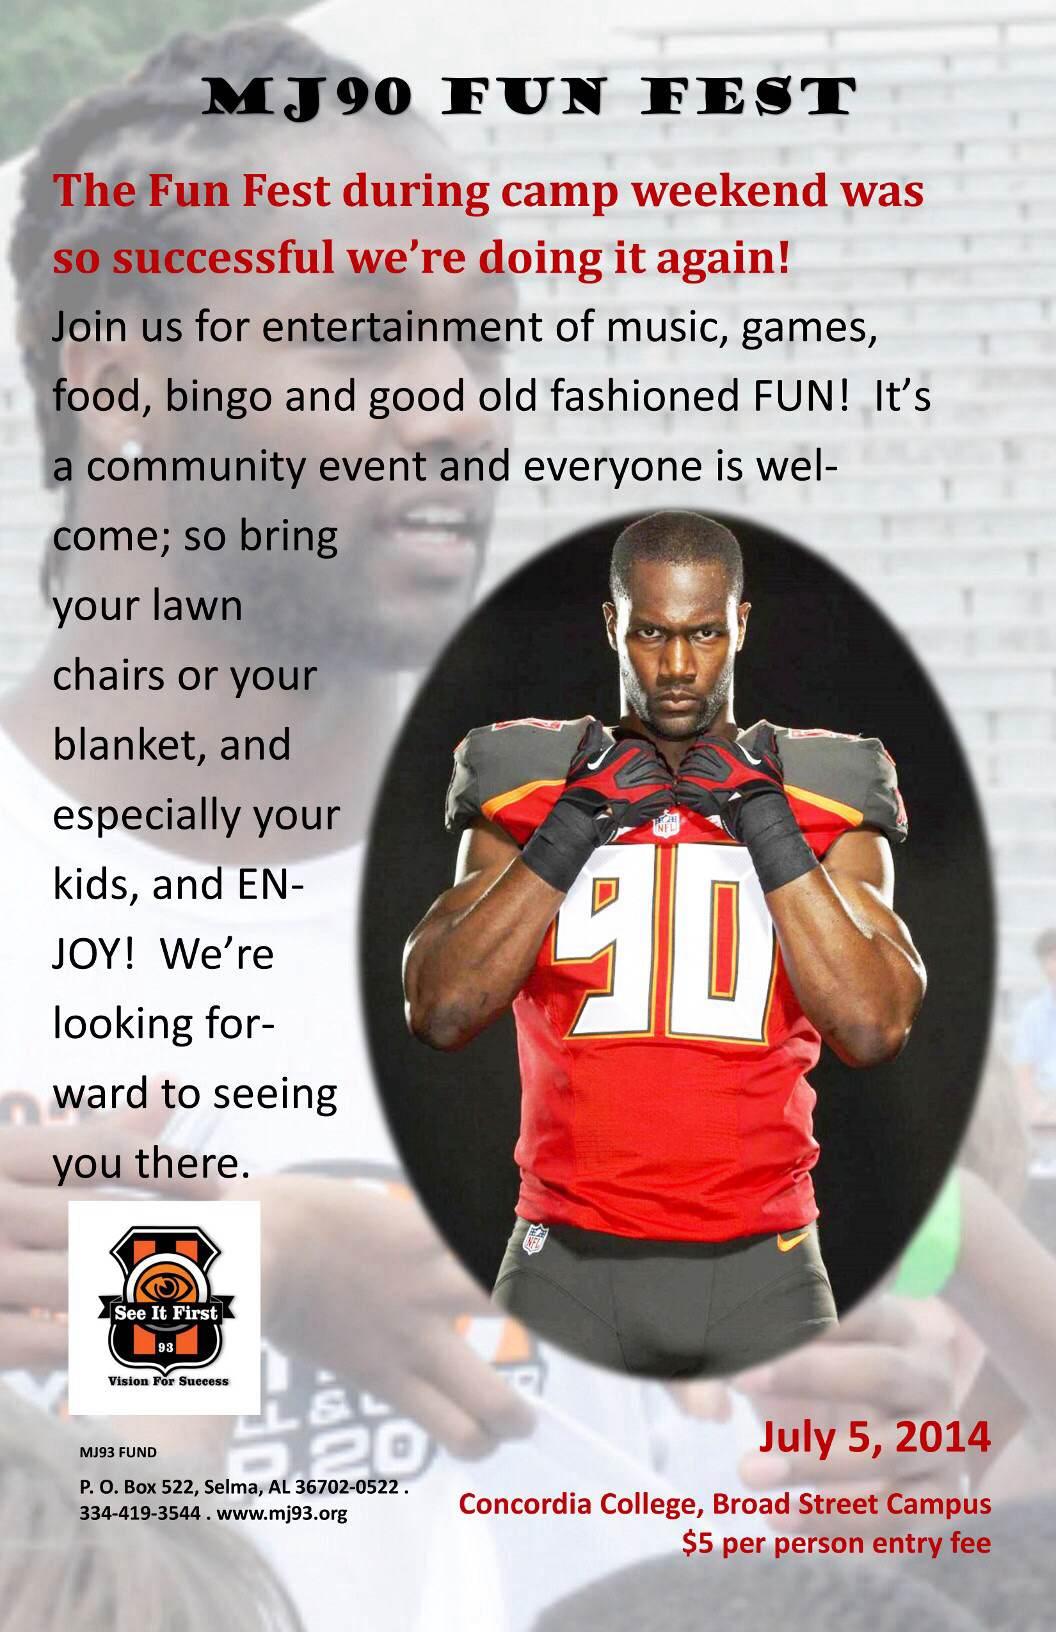 MJ90 Fun Fest – July 5th Concordia College, Broad St. Campus